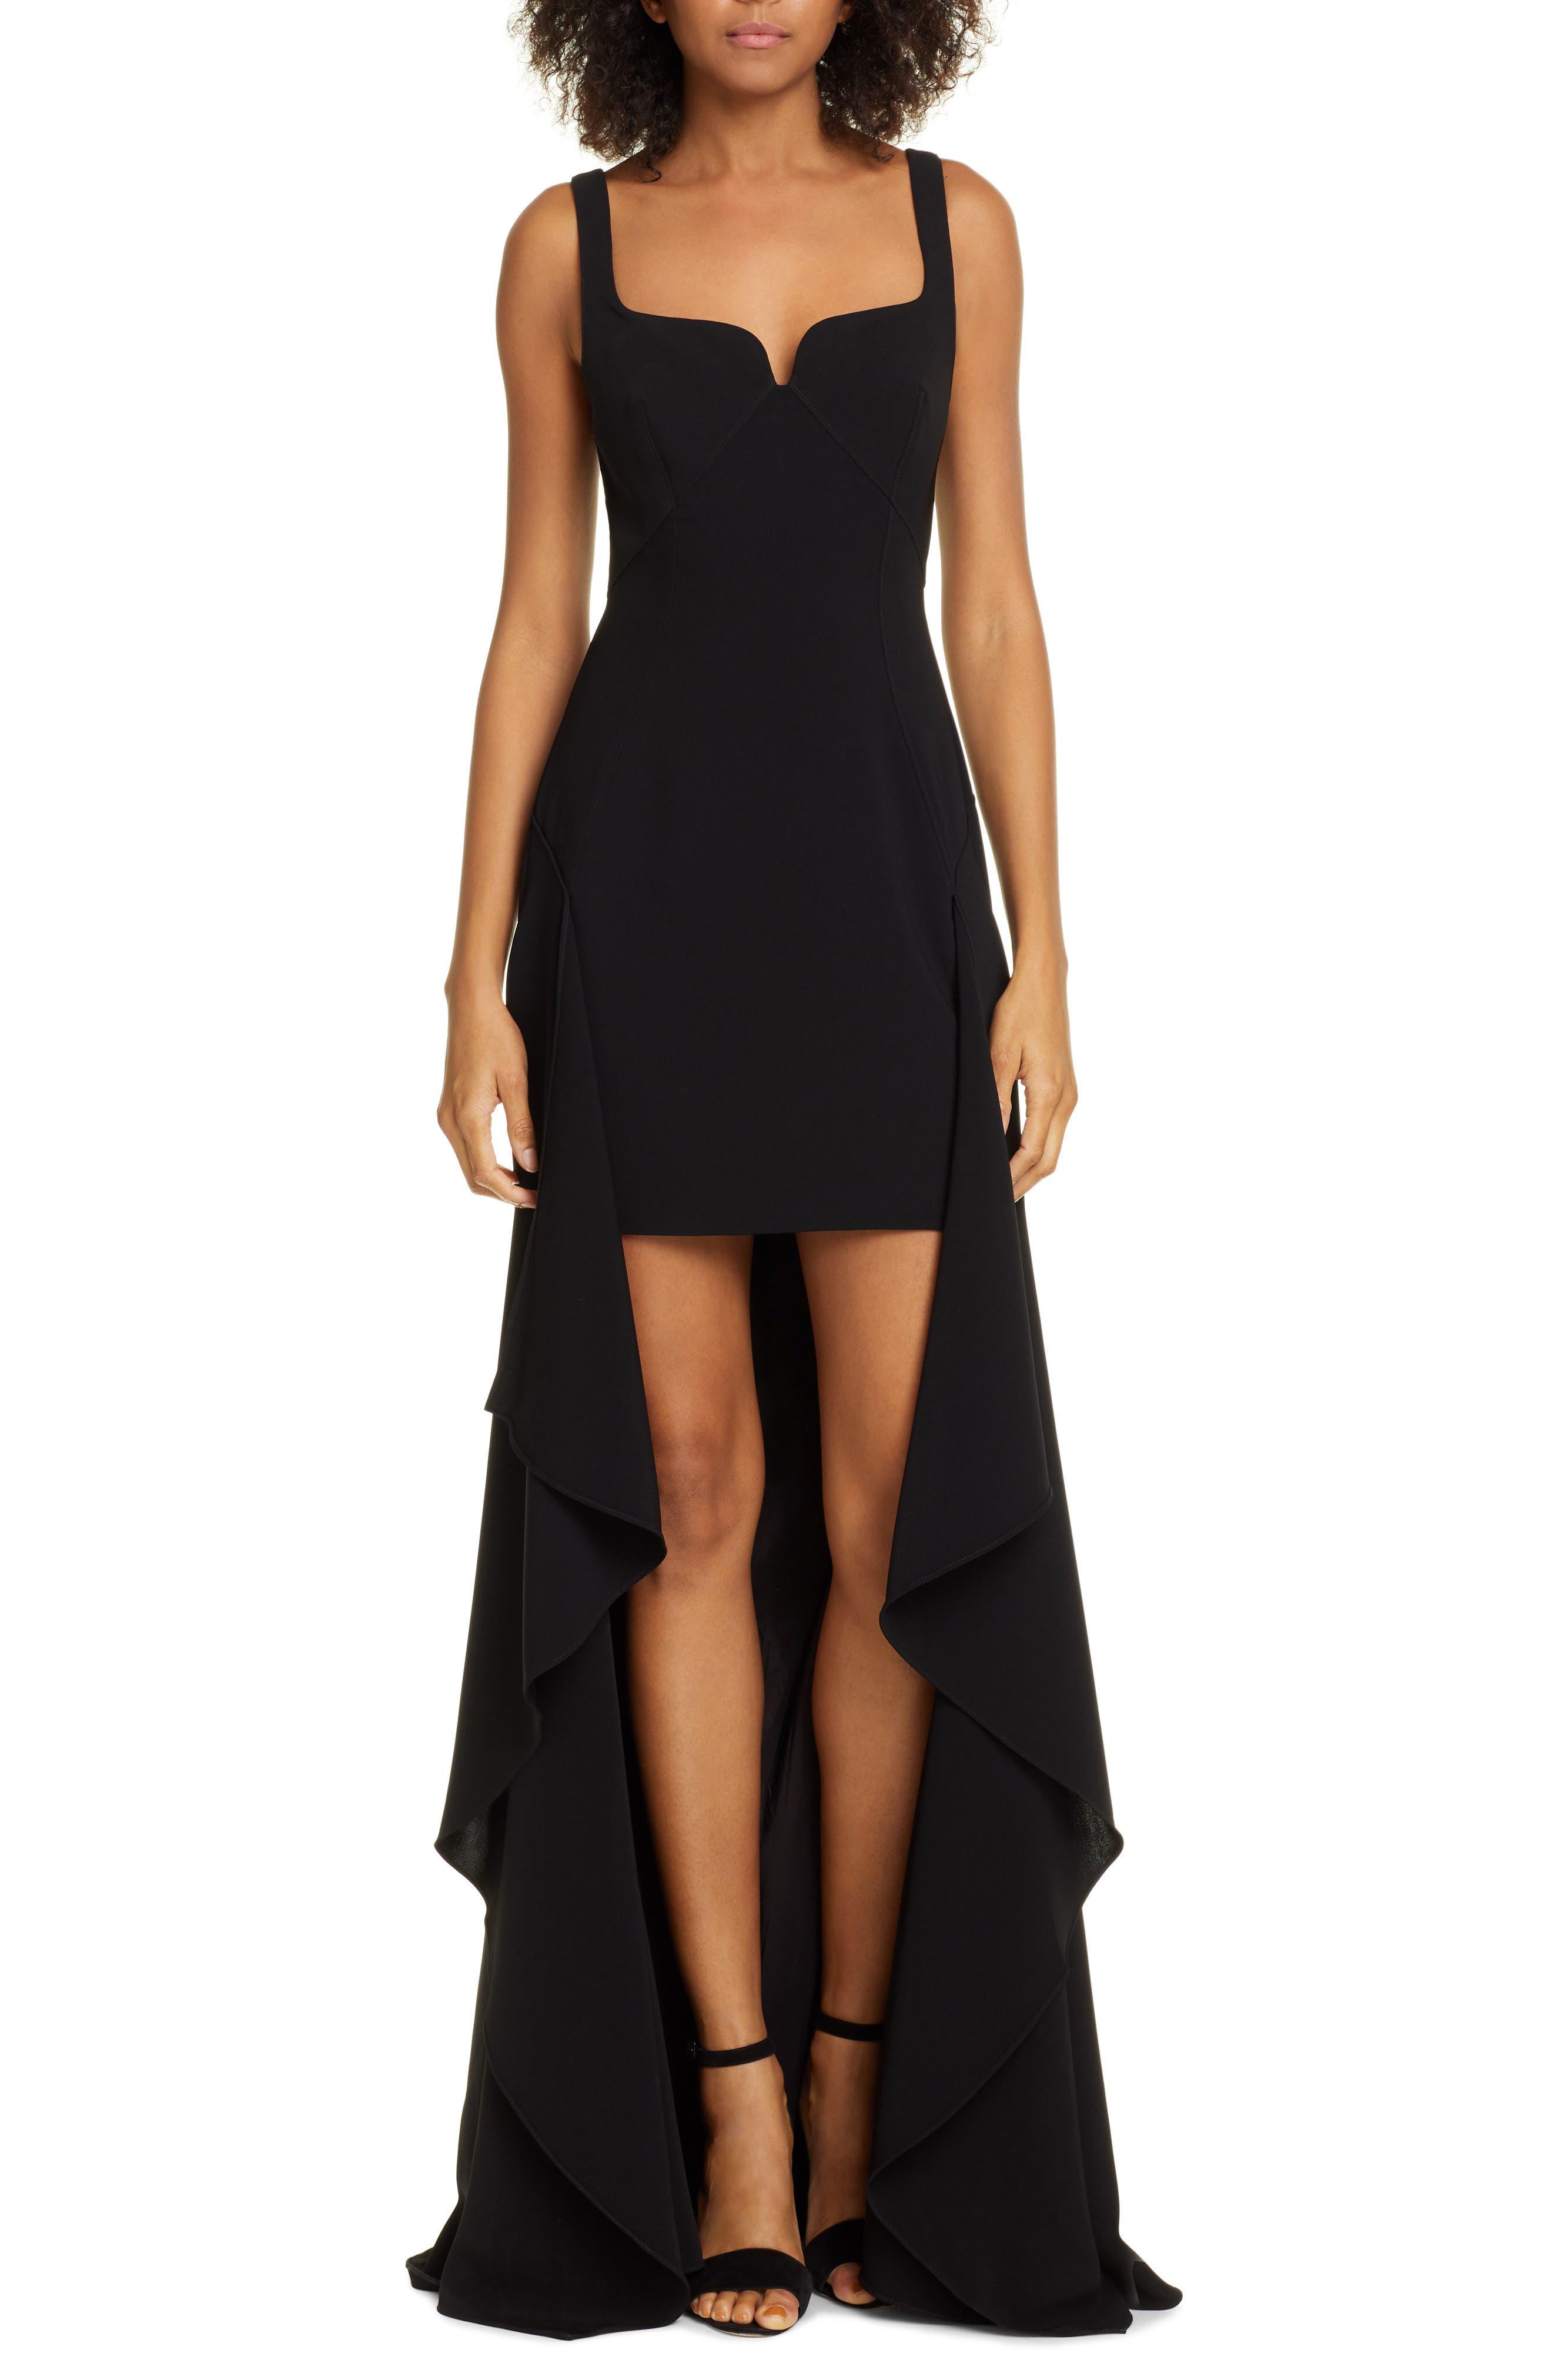 Cinq A Sept Lottie High/low Evening Dress, Black